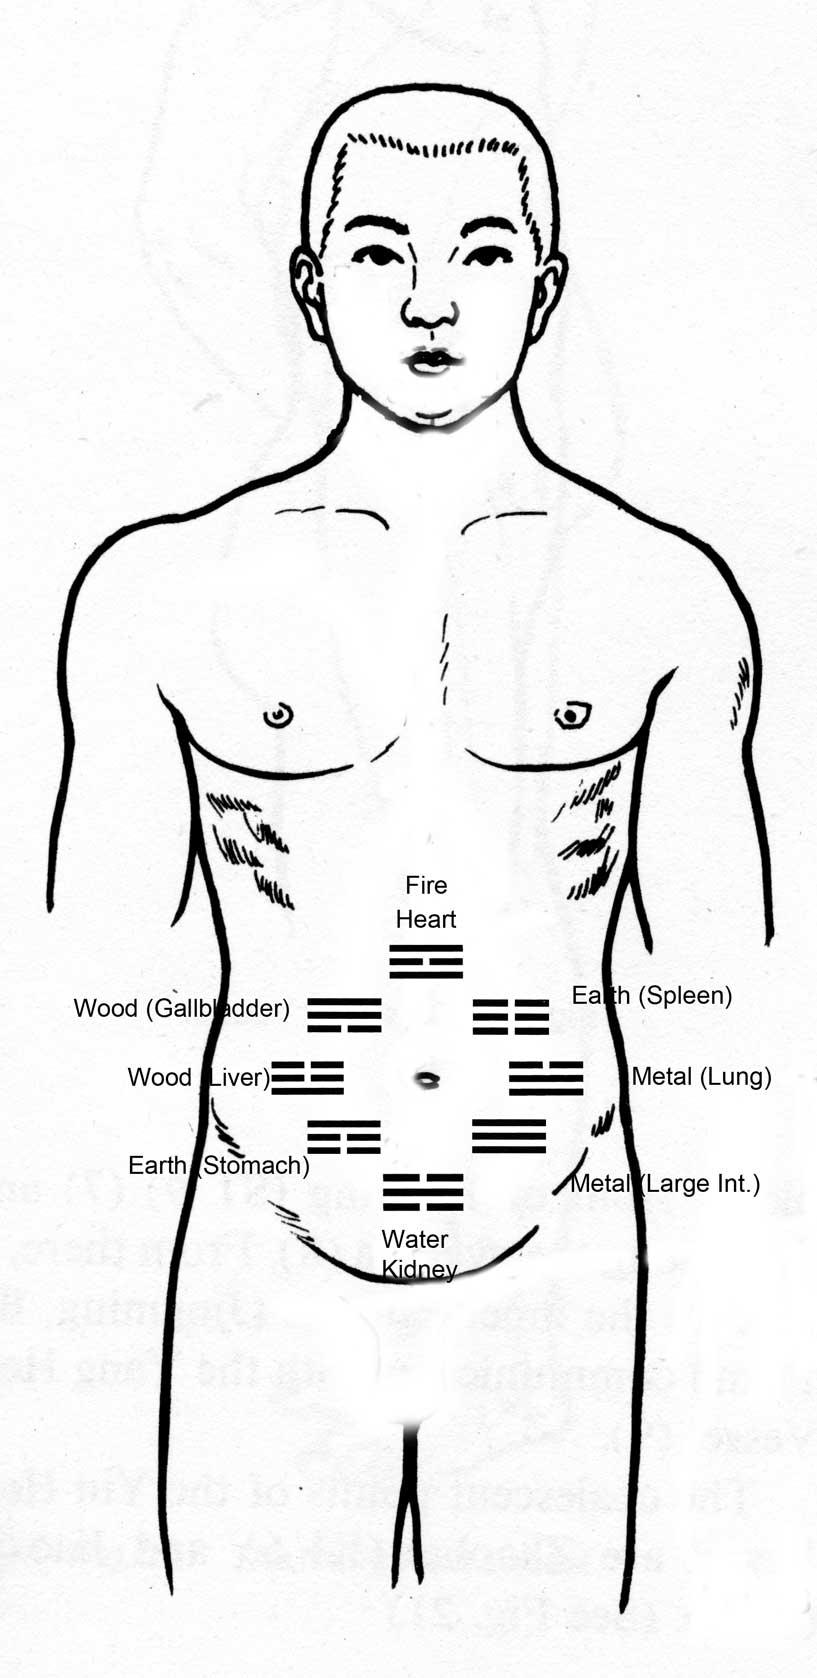 Ba Ga Abdominal Acupuncture Class